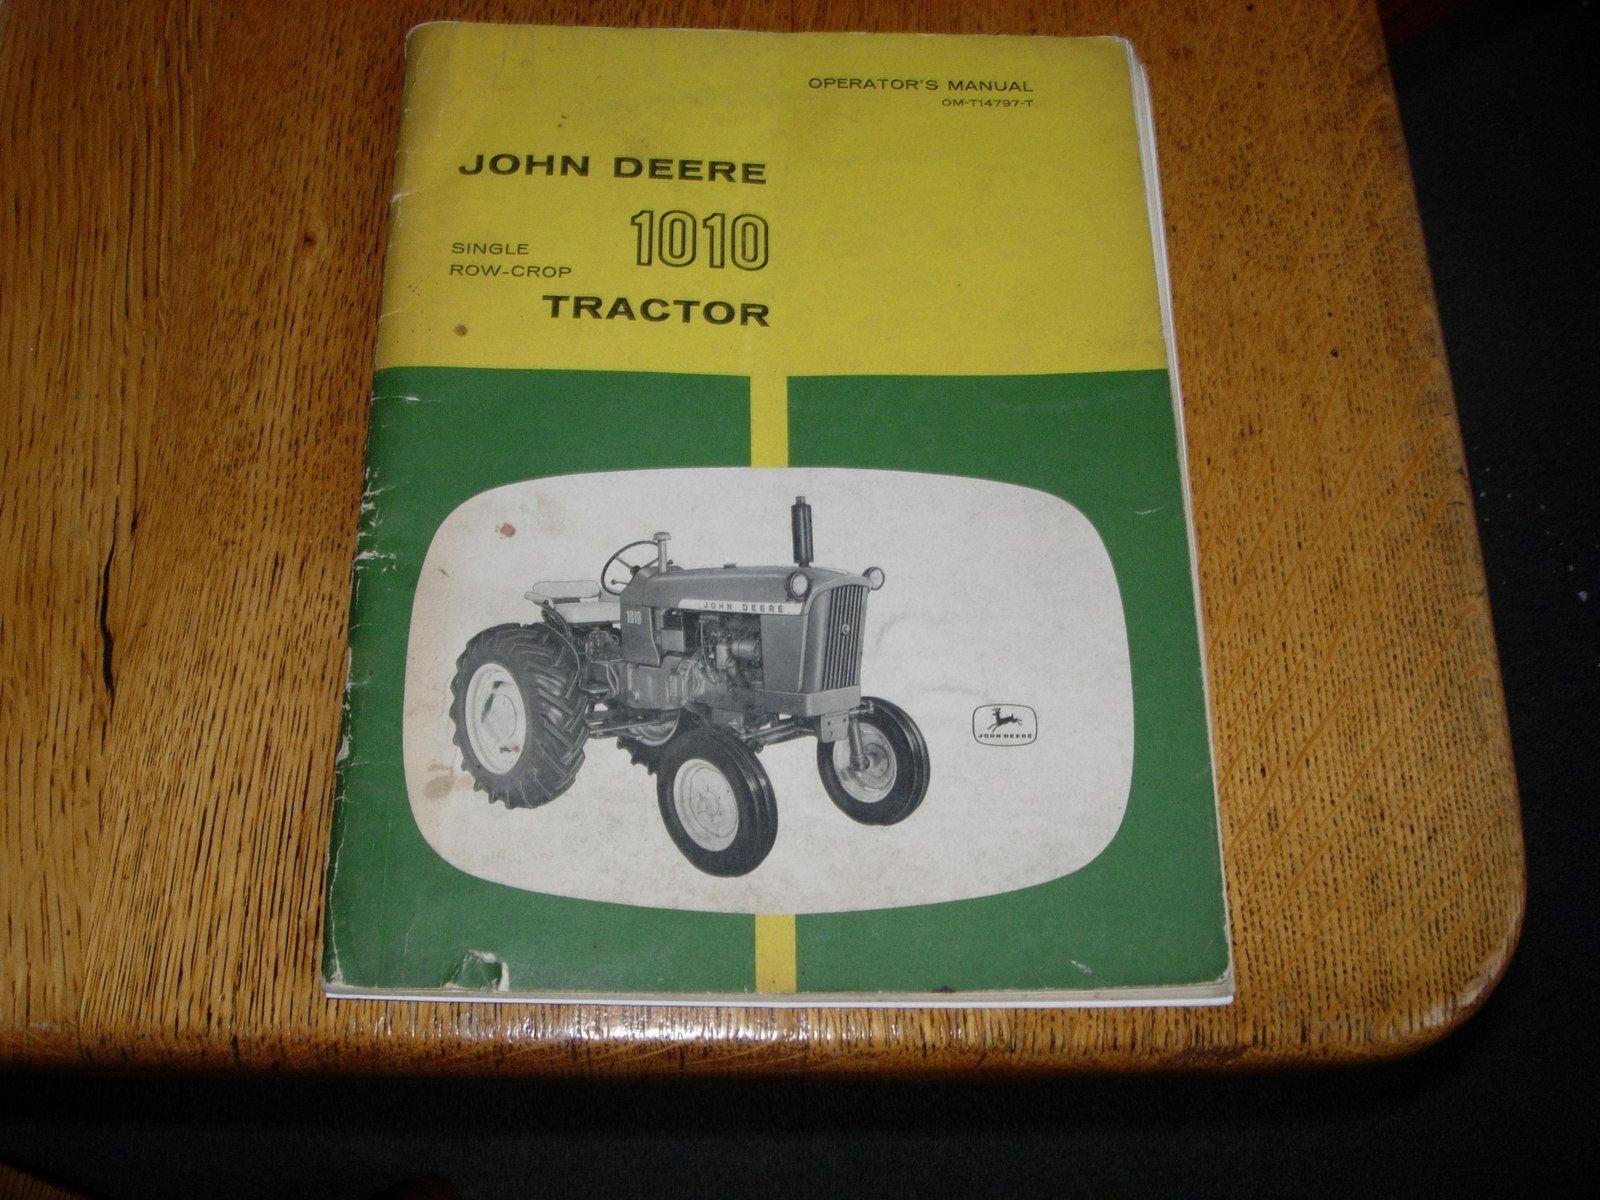 John Deere 1010 Tractor Diagram Wiring Vintage Operators Manual 1600x1200